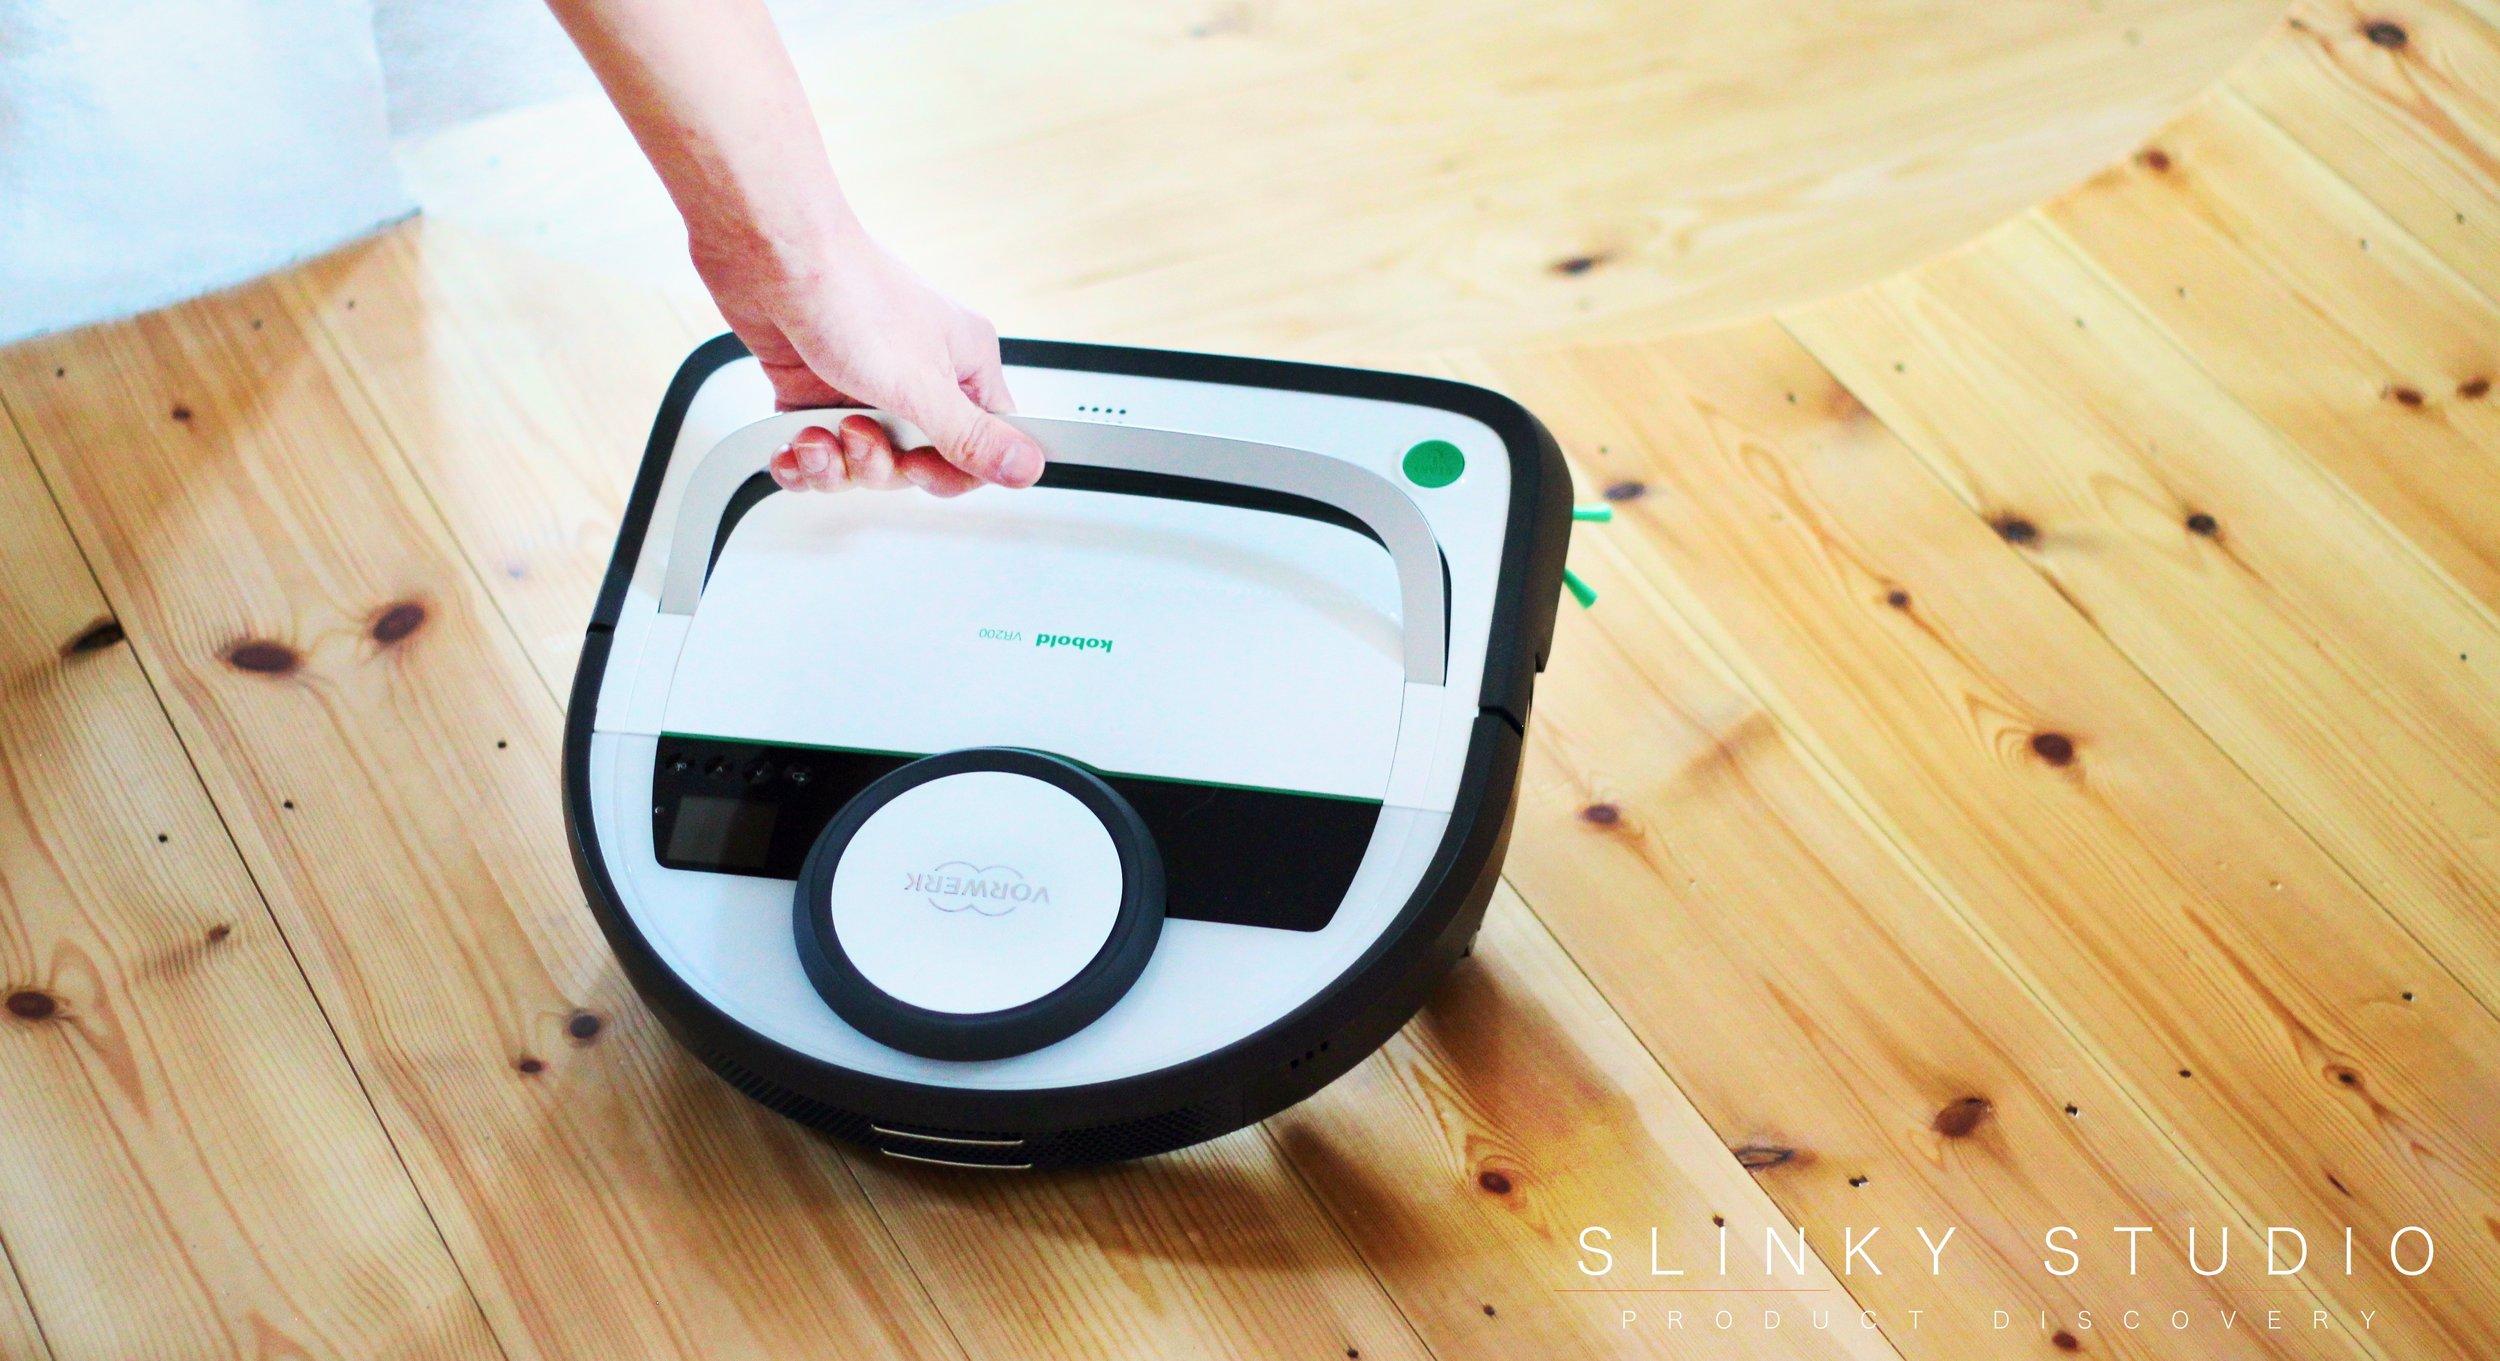 Vorwerk Kobold VR200 Robot Cleaner Handle.jpg